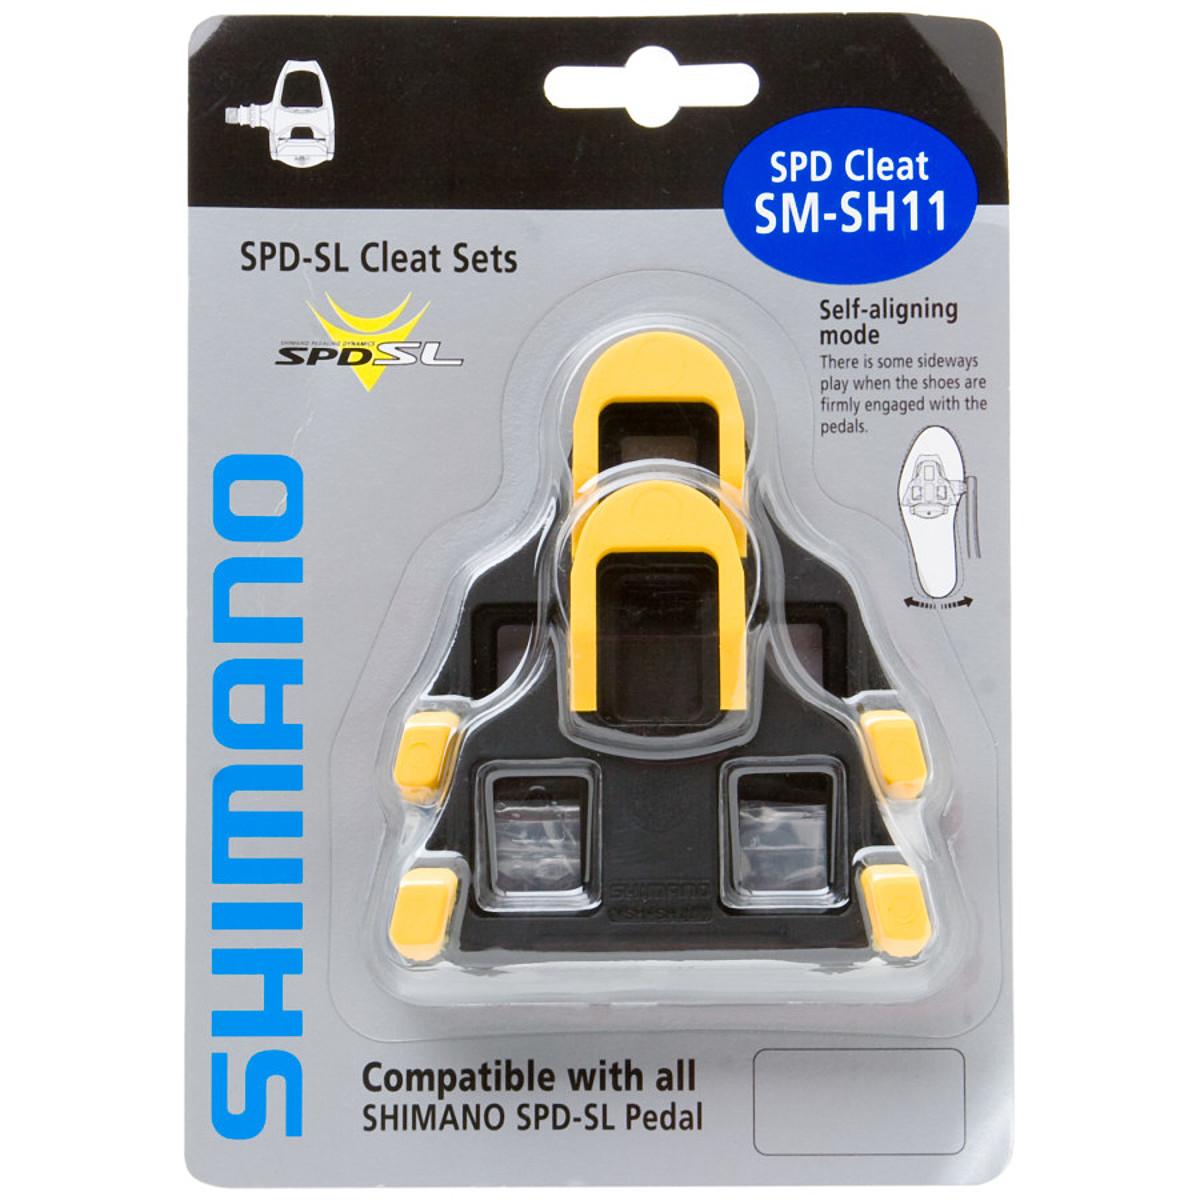 ec1e97e52576 Shimano SPD-SL Cleat Set - Sweet Pete's Bike Shop Toronto